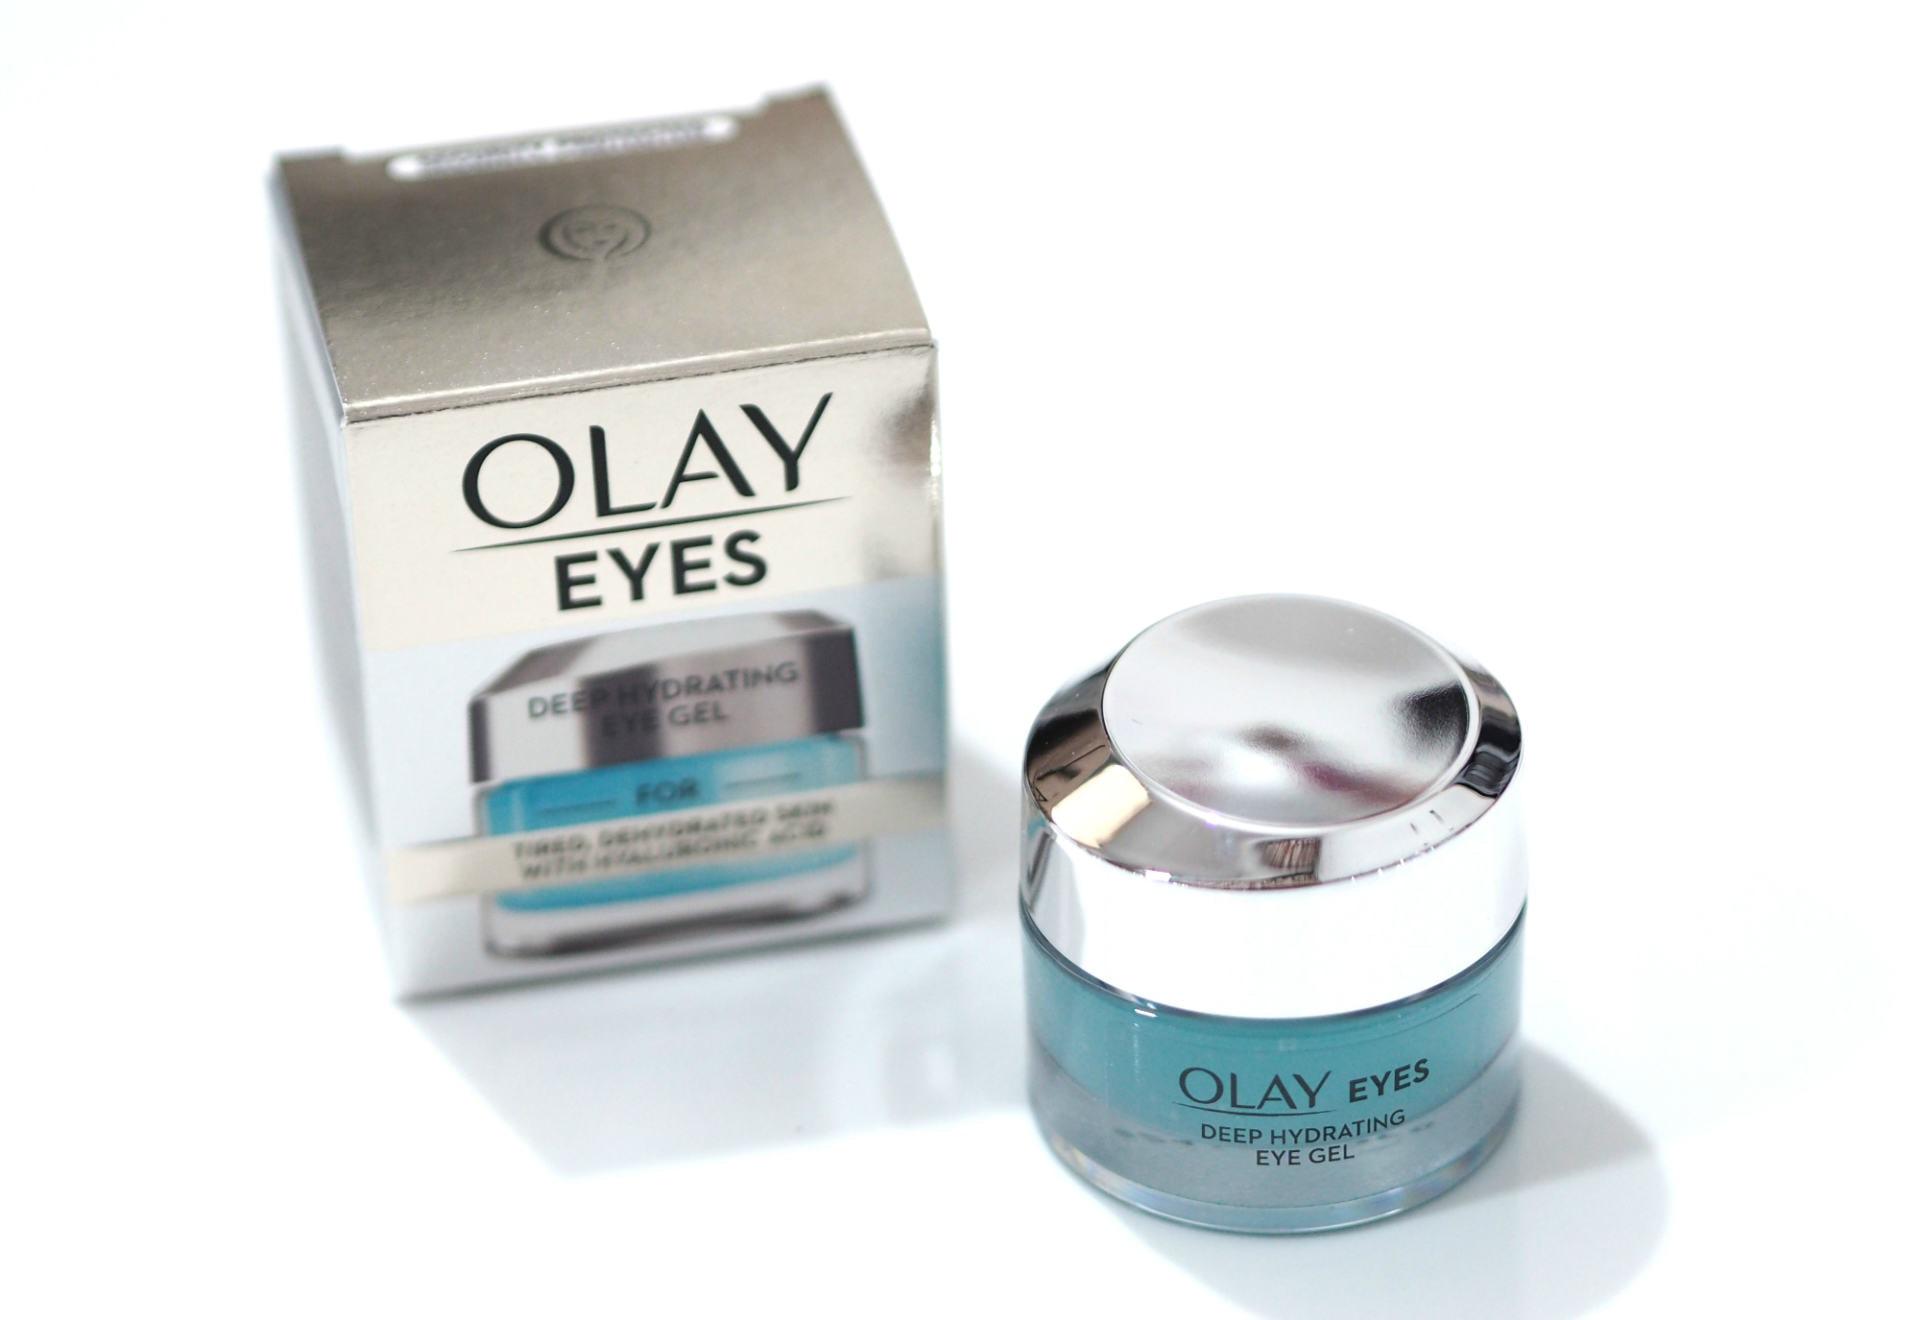 Olay Eyes Deep Hydrating Eye Gel Review